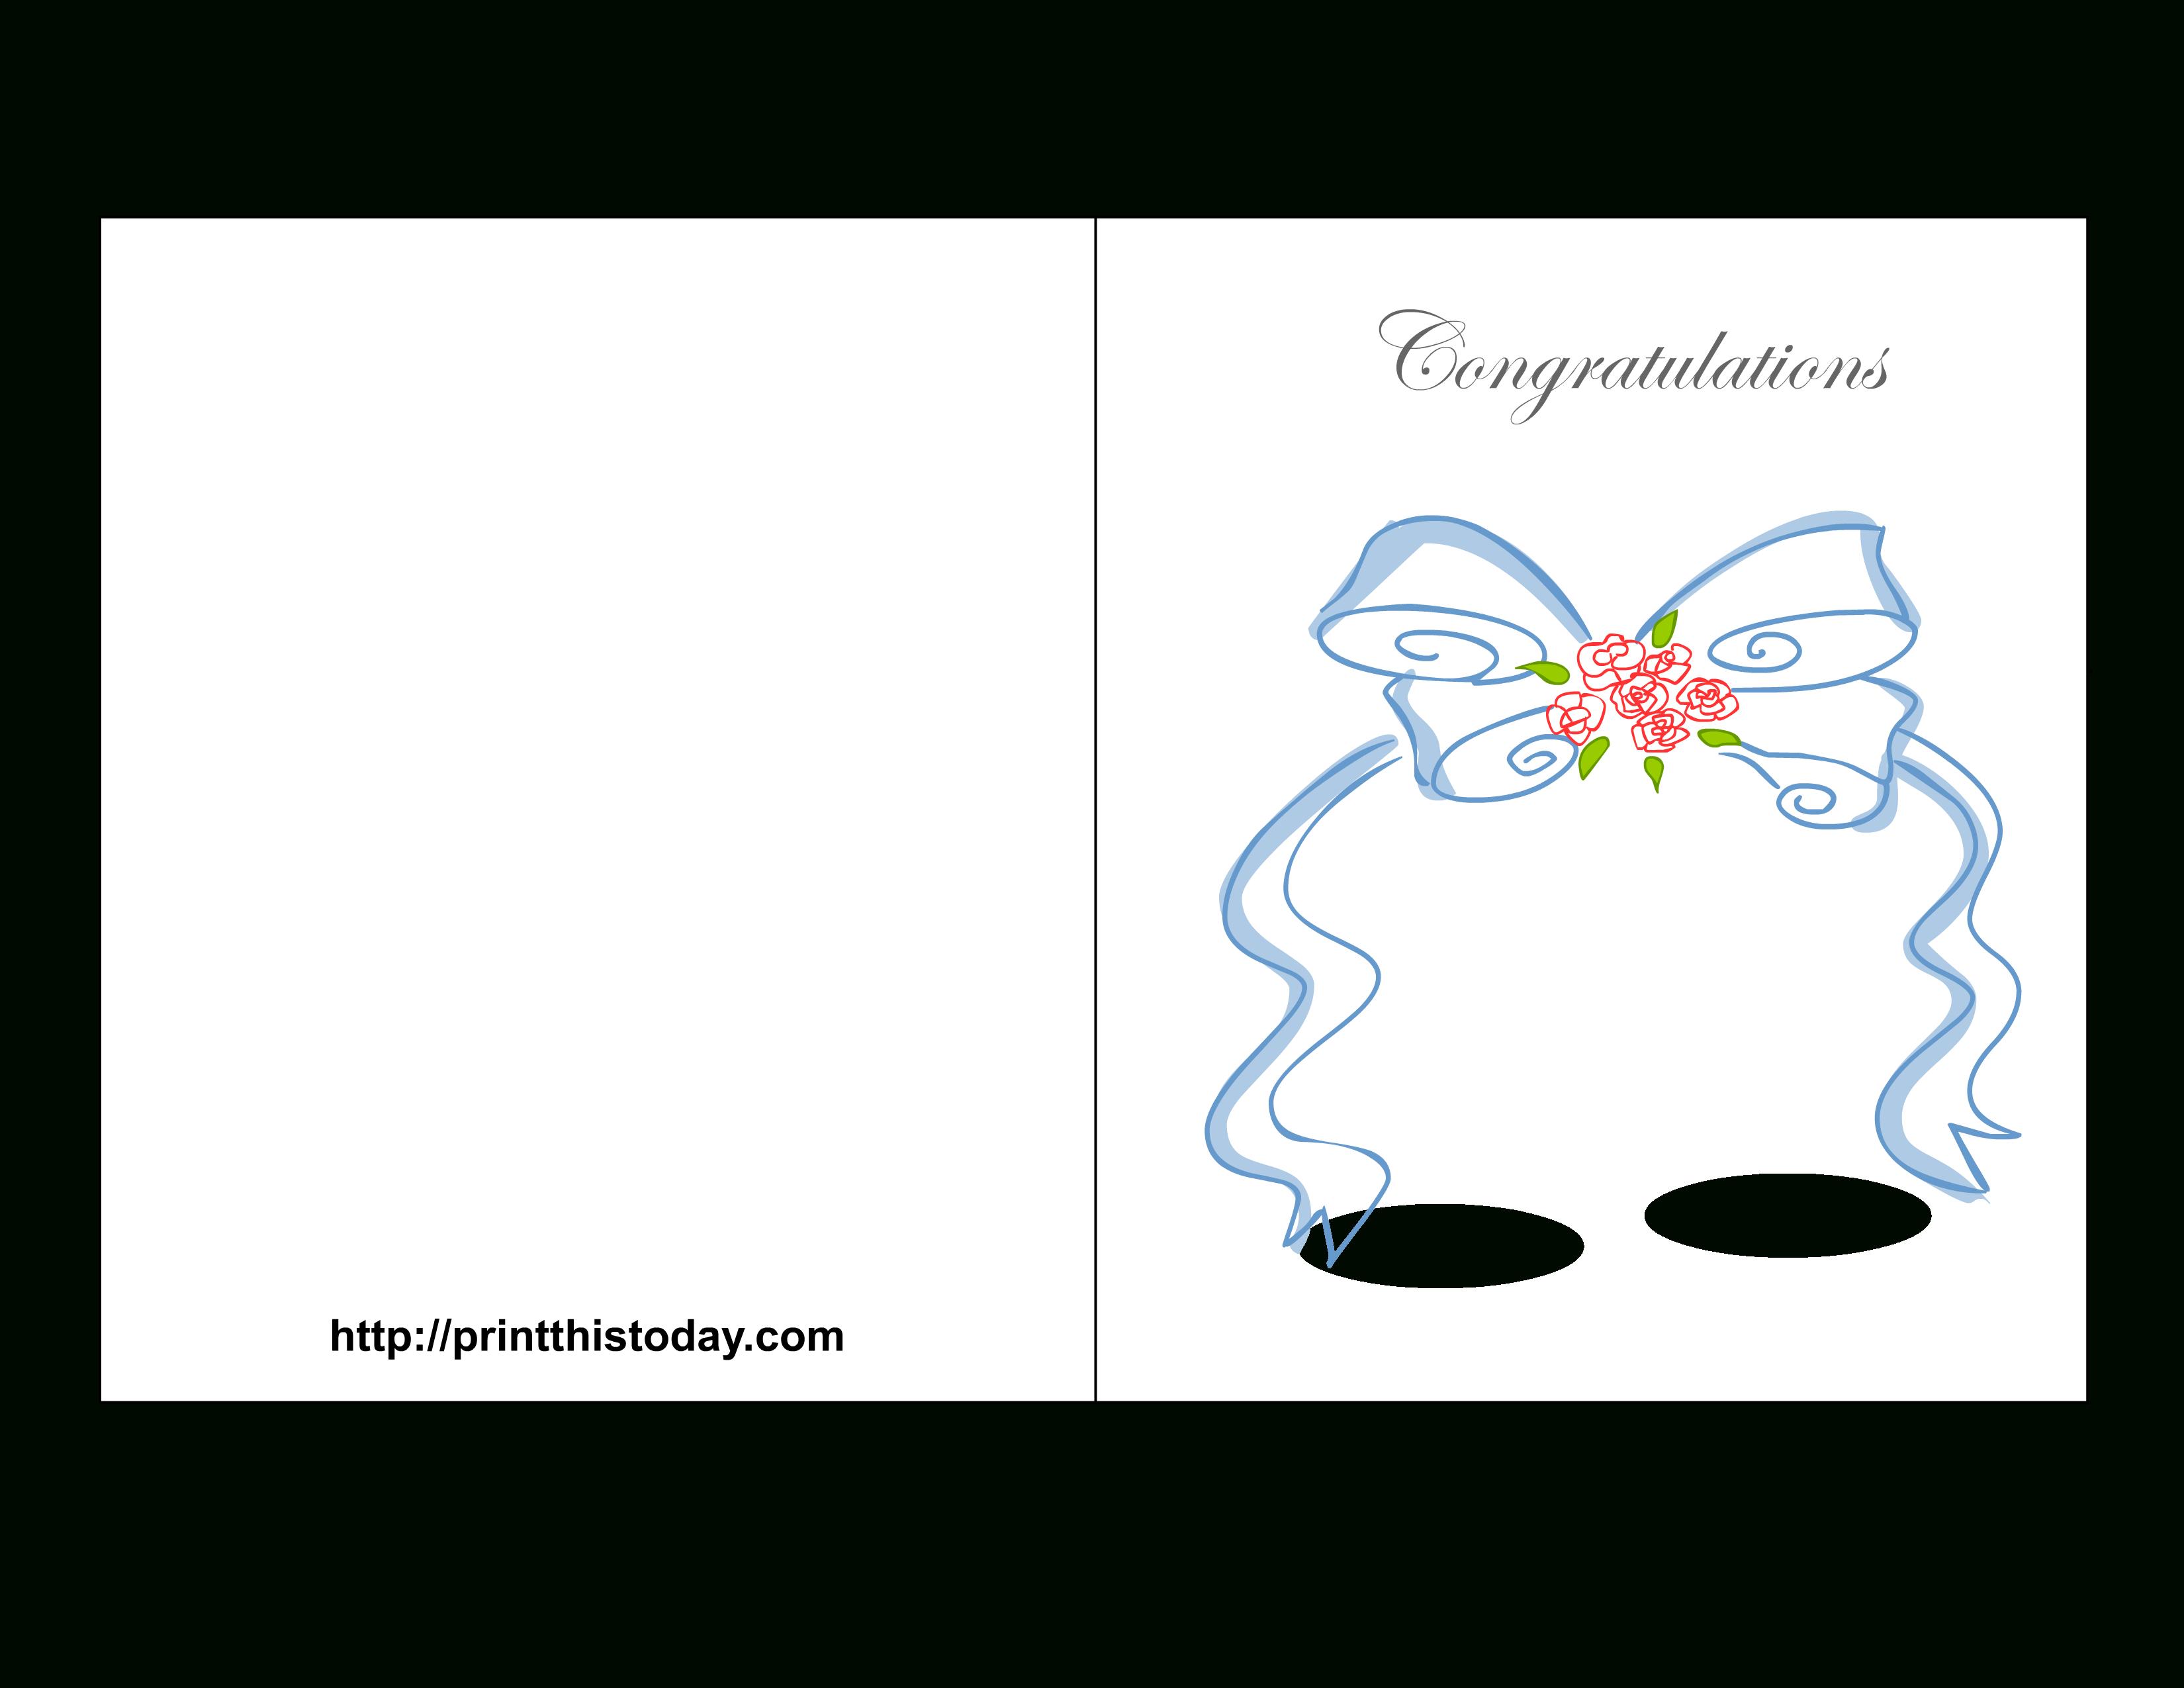 Free Printable Wedding Congratulations Cards - Free Printable Wedding Congratulations Greeting Cards